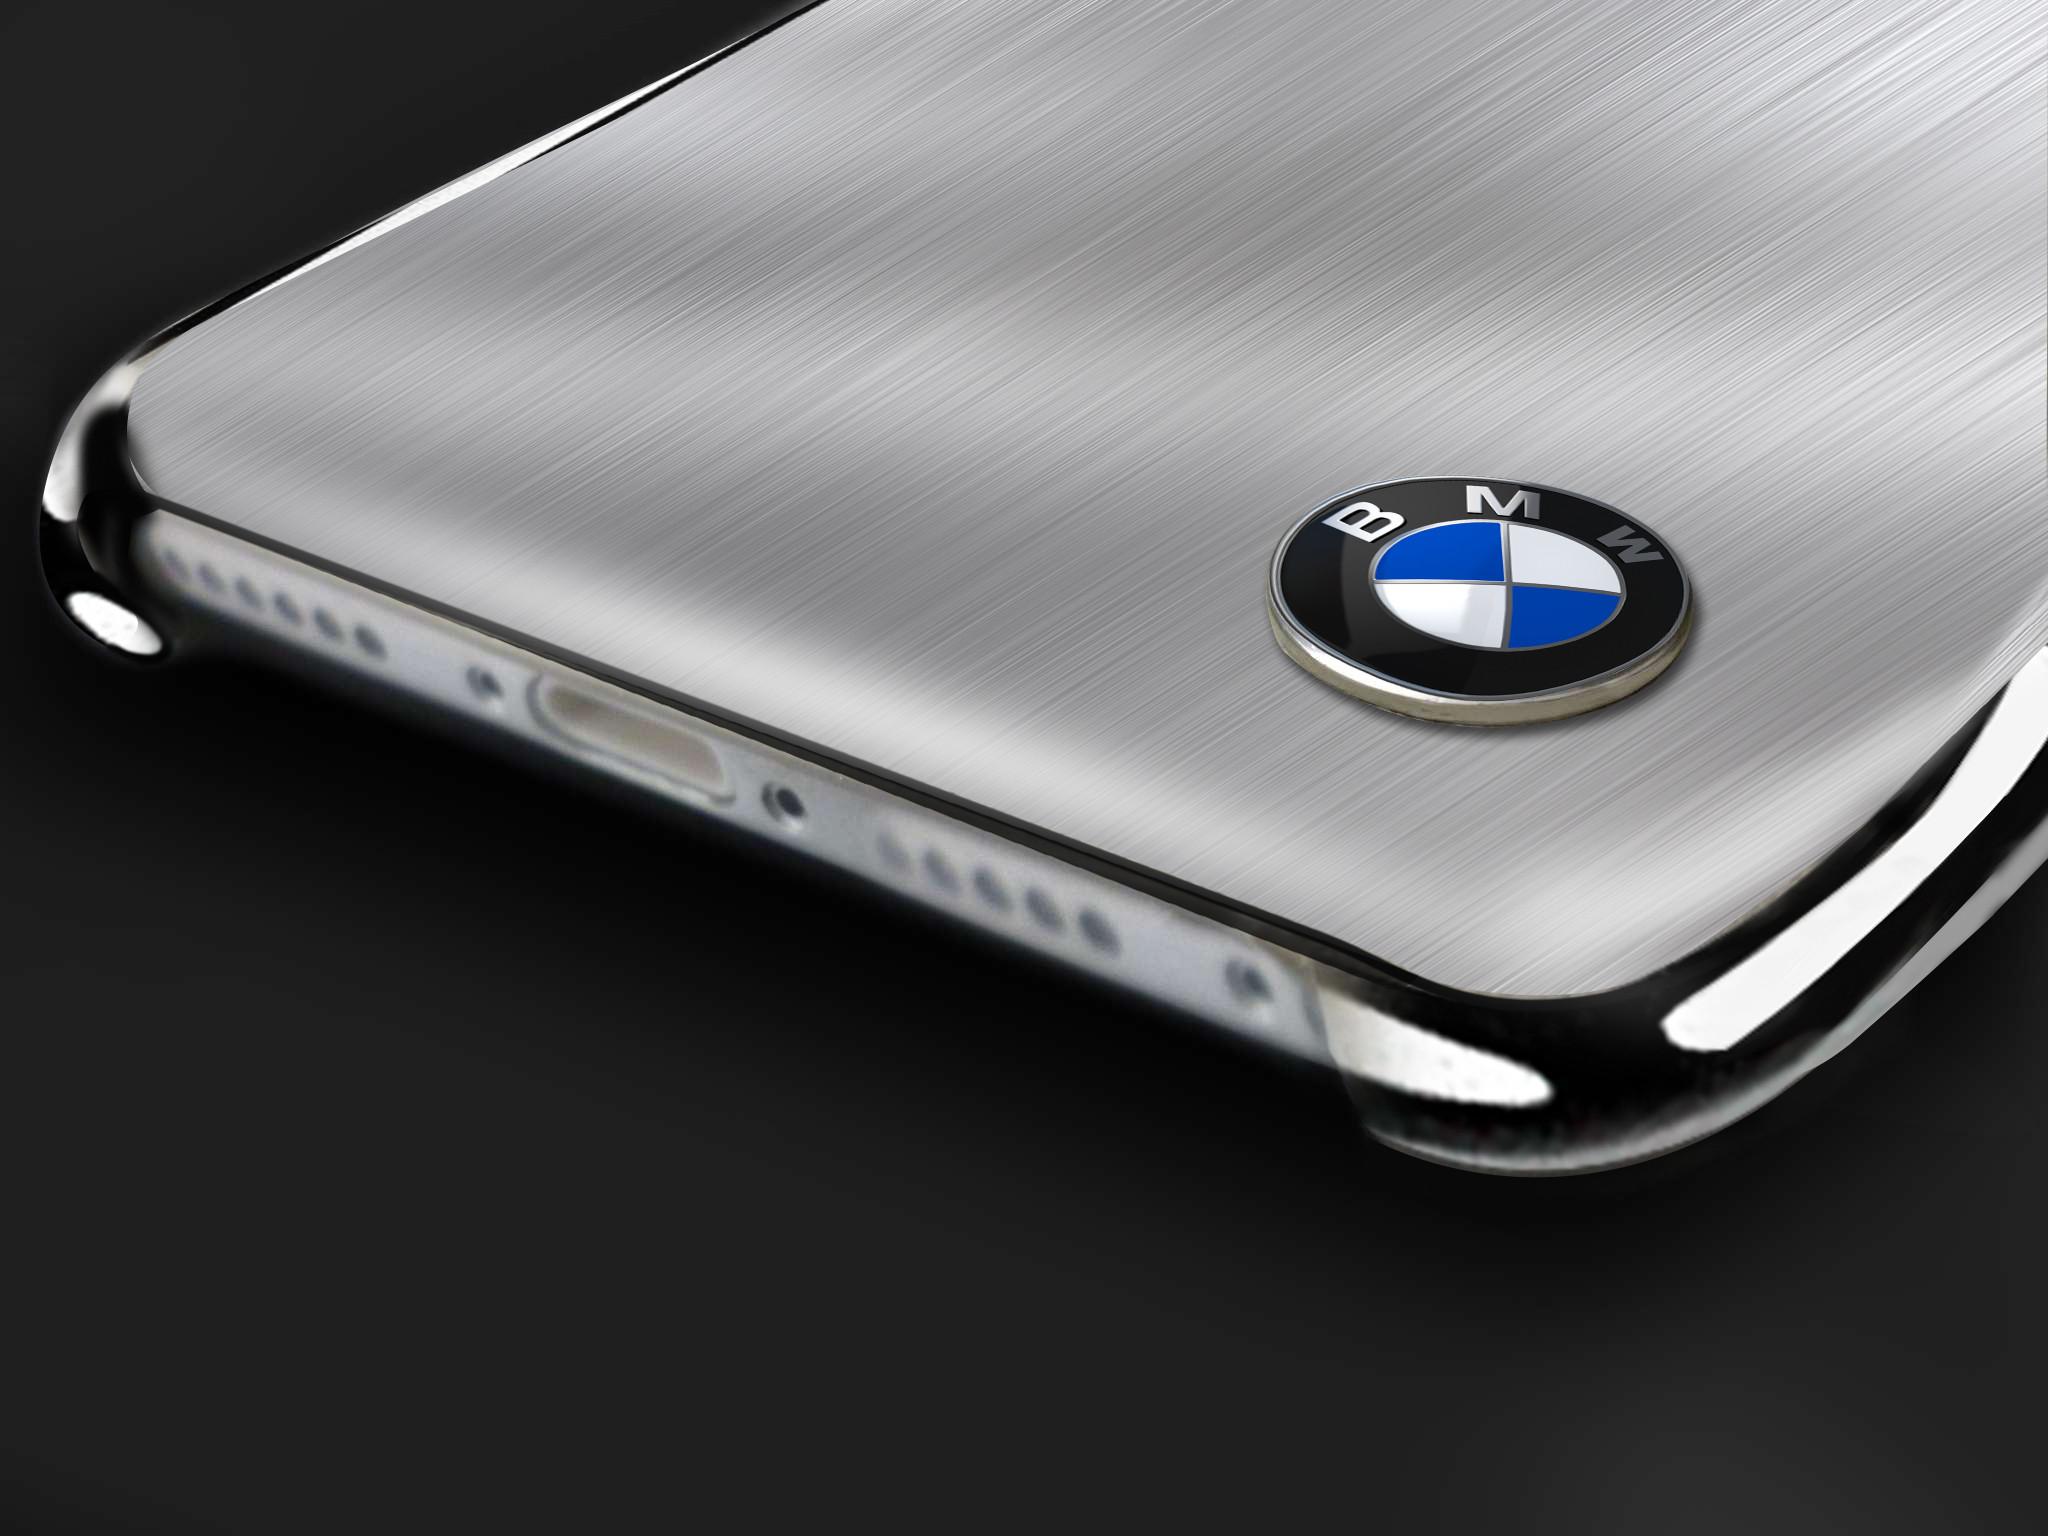 Bmw 174 Apple Iphone X 7 Series Steel Edition Luxurious